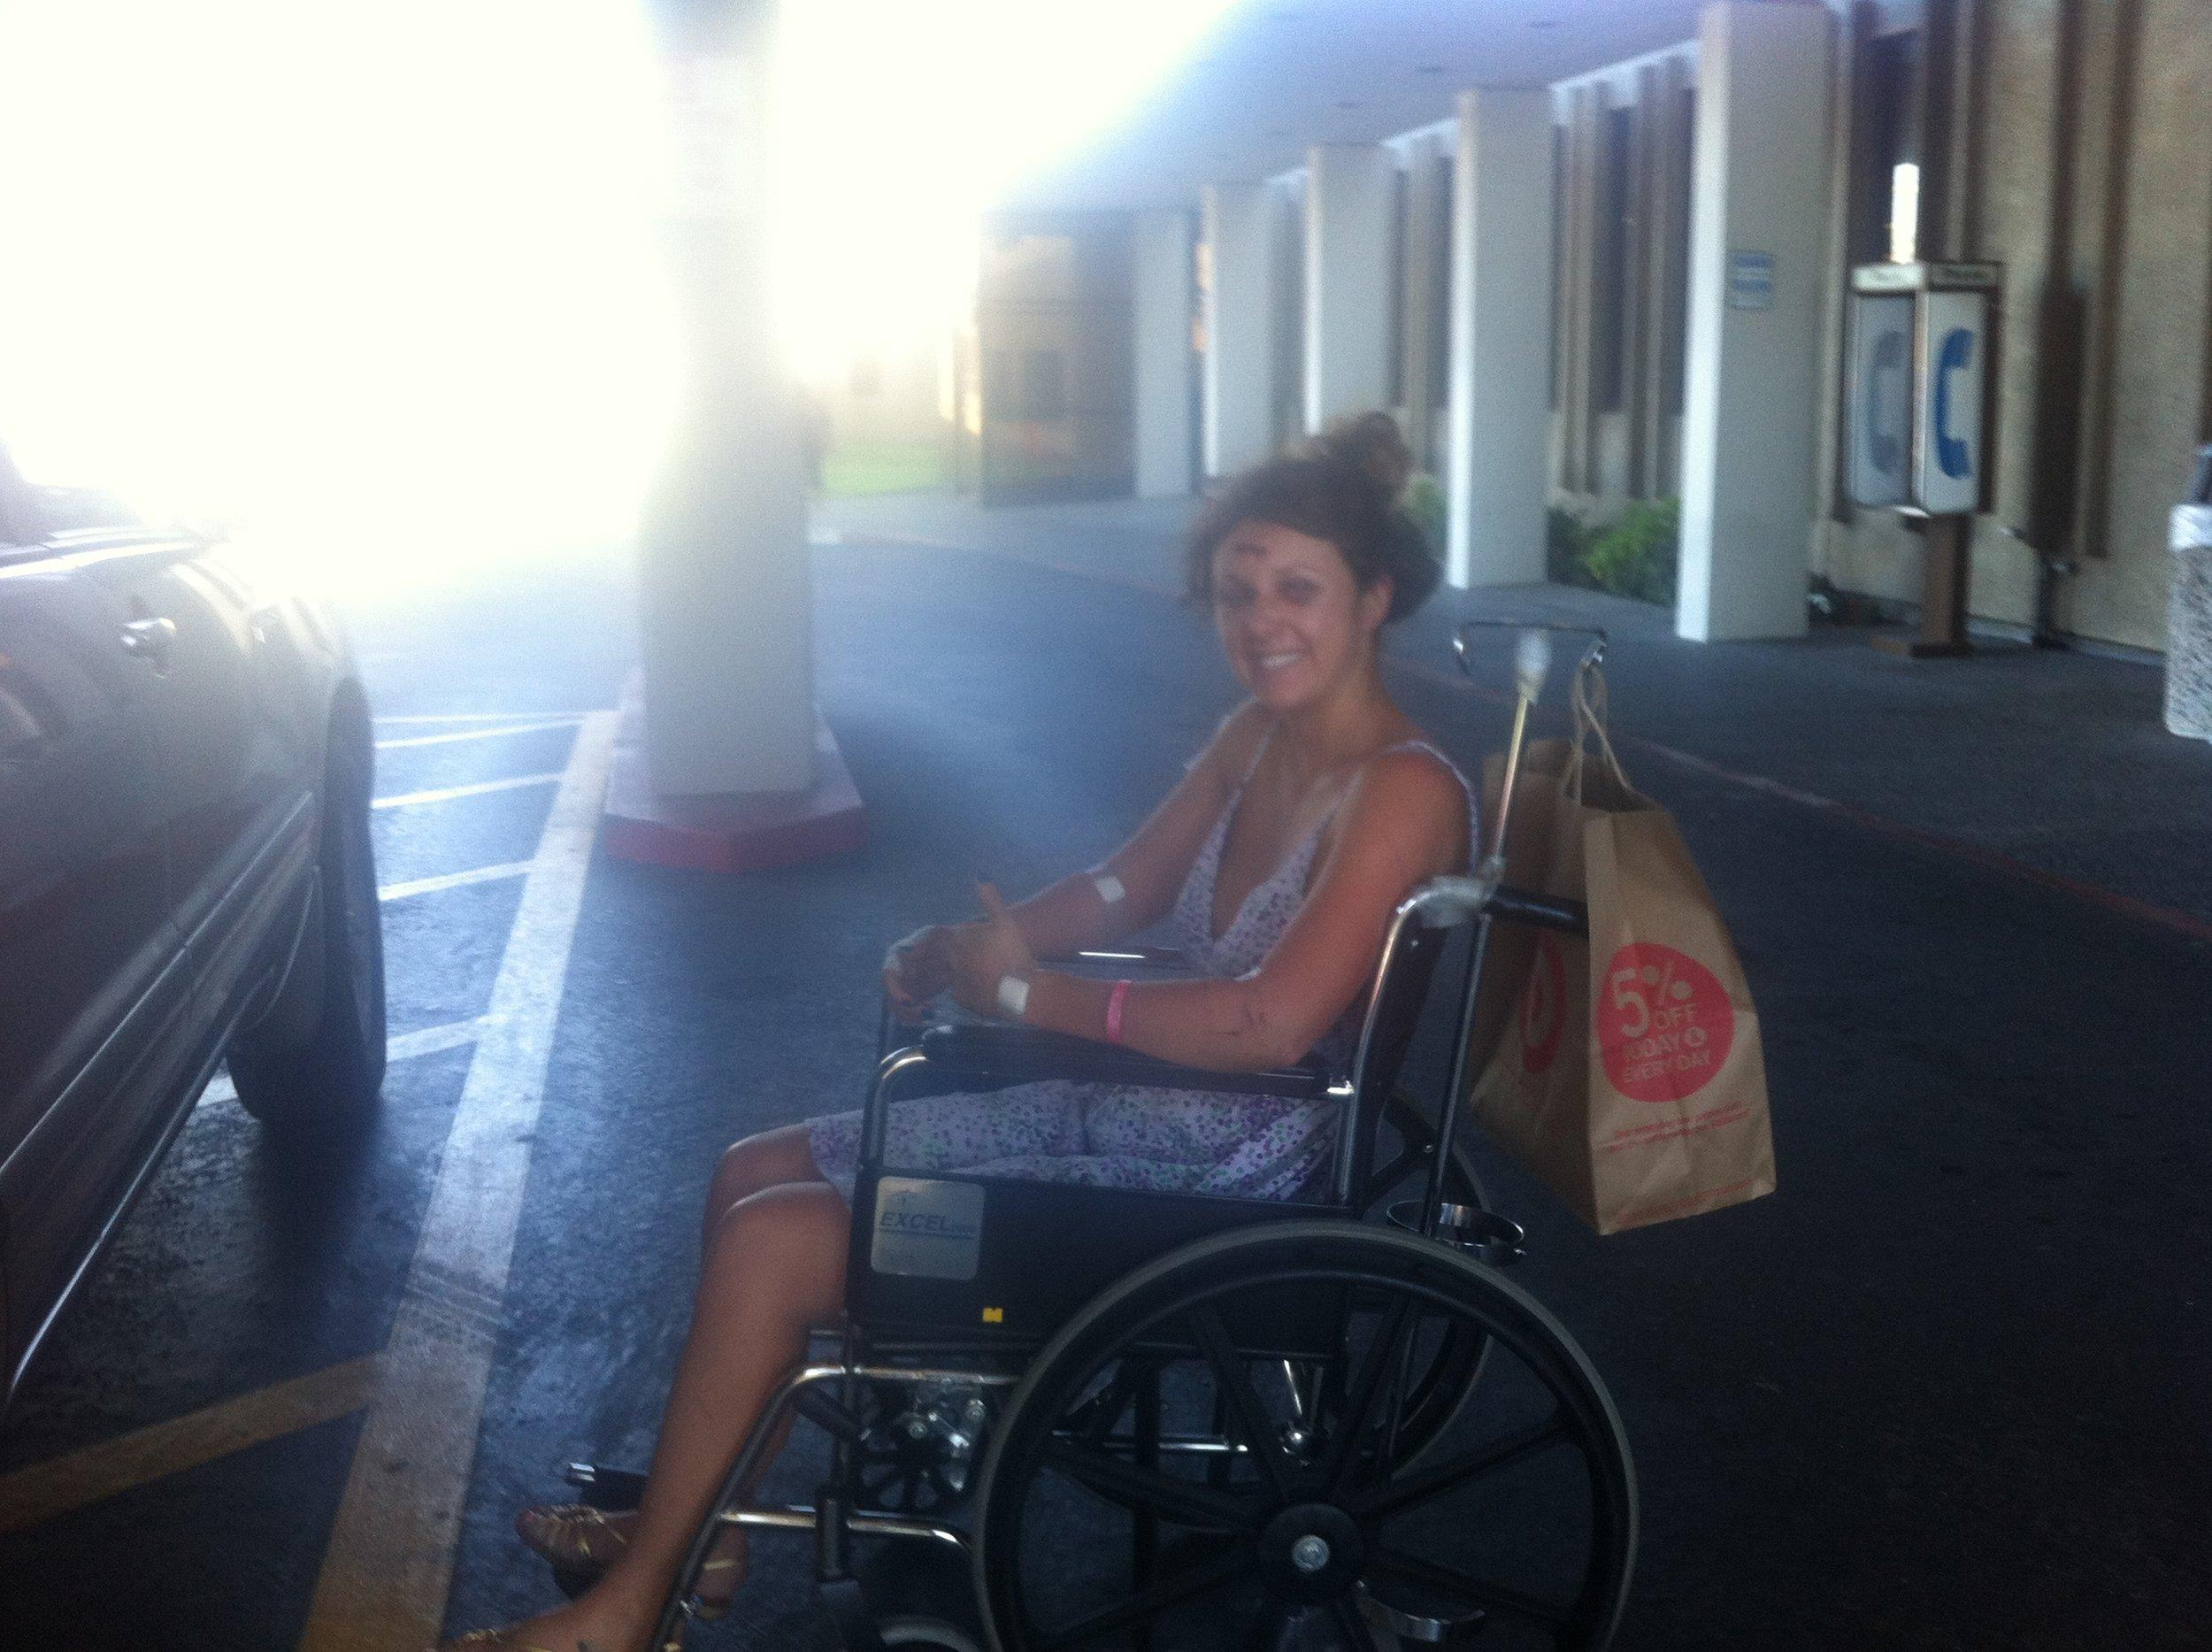 Finally leaving the hospital